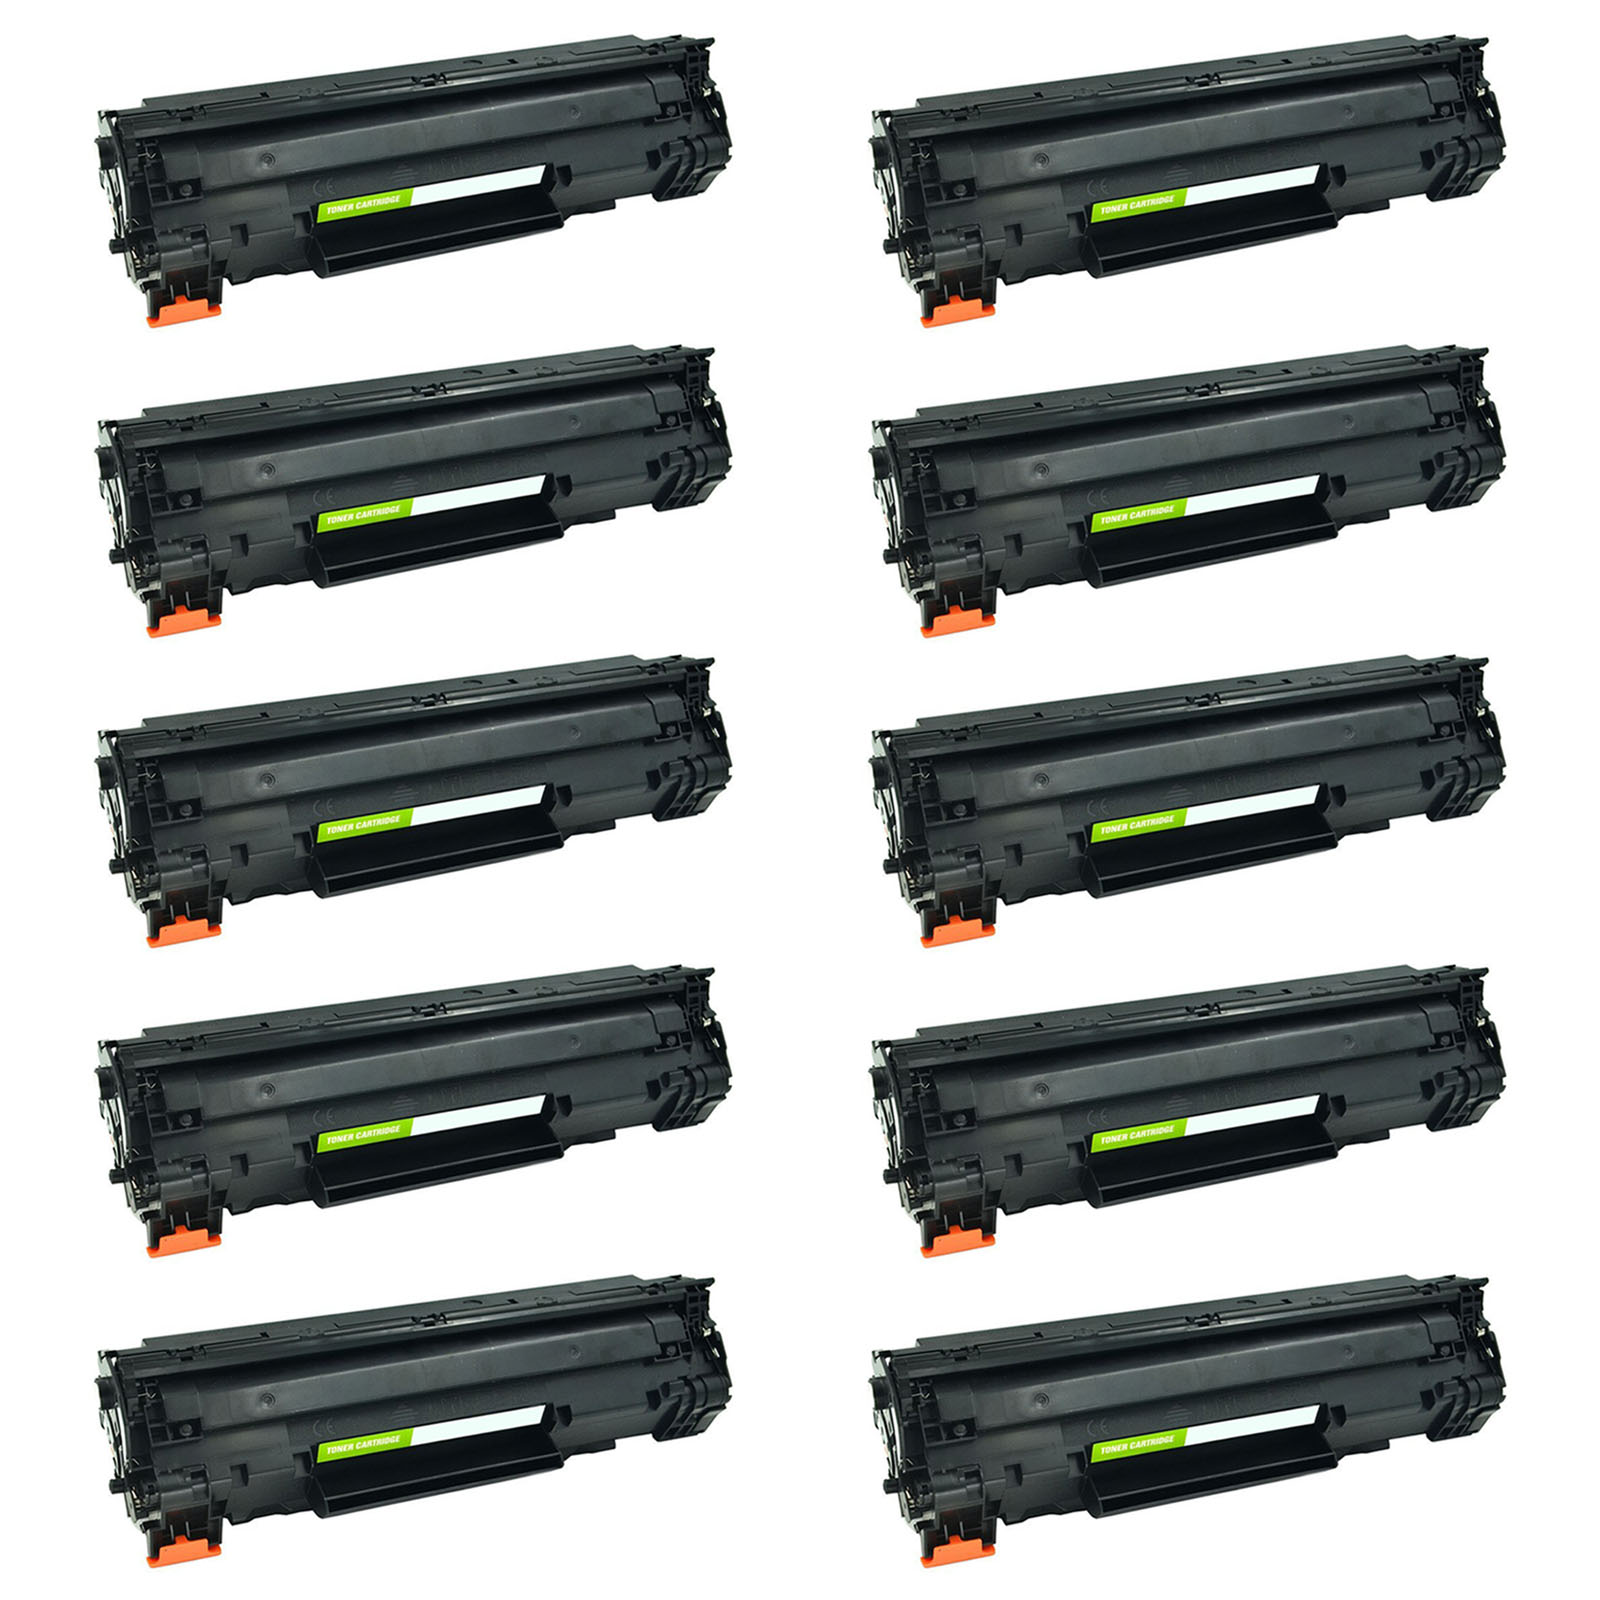 5 Pack CB436A 36A Black Toner Cartridge For HP LaserJet M1120 M1522 MFP P1505